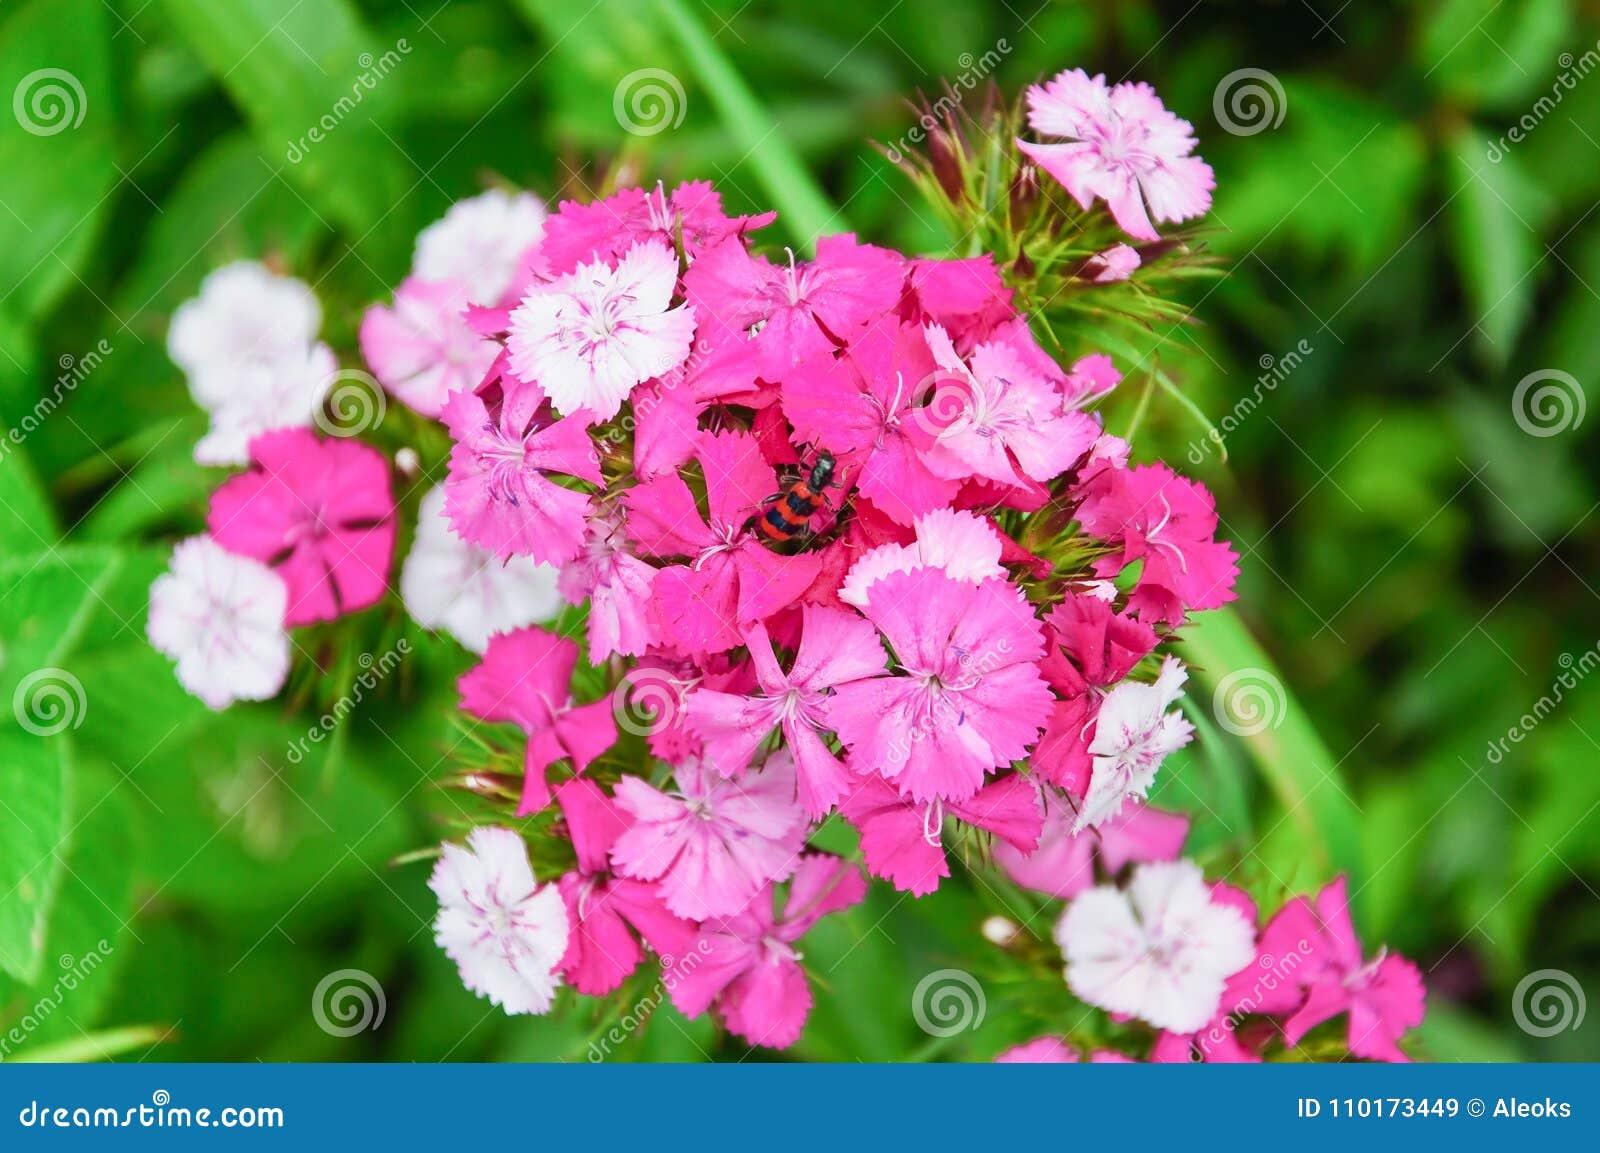 Flowers Of Sweet William Dianthus Barbatus Stock Image Image Of